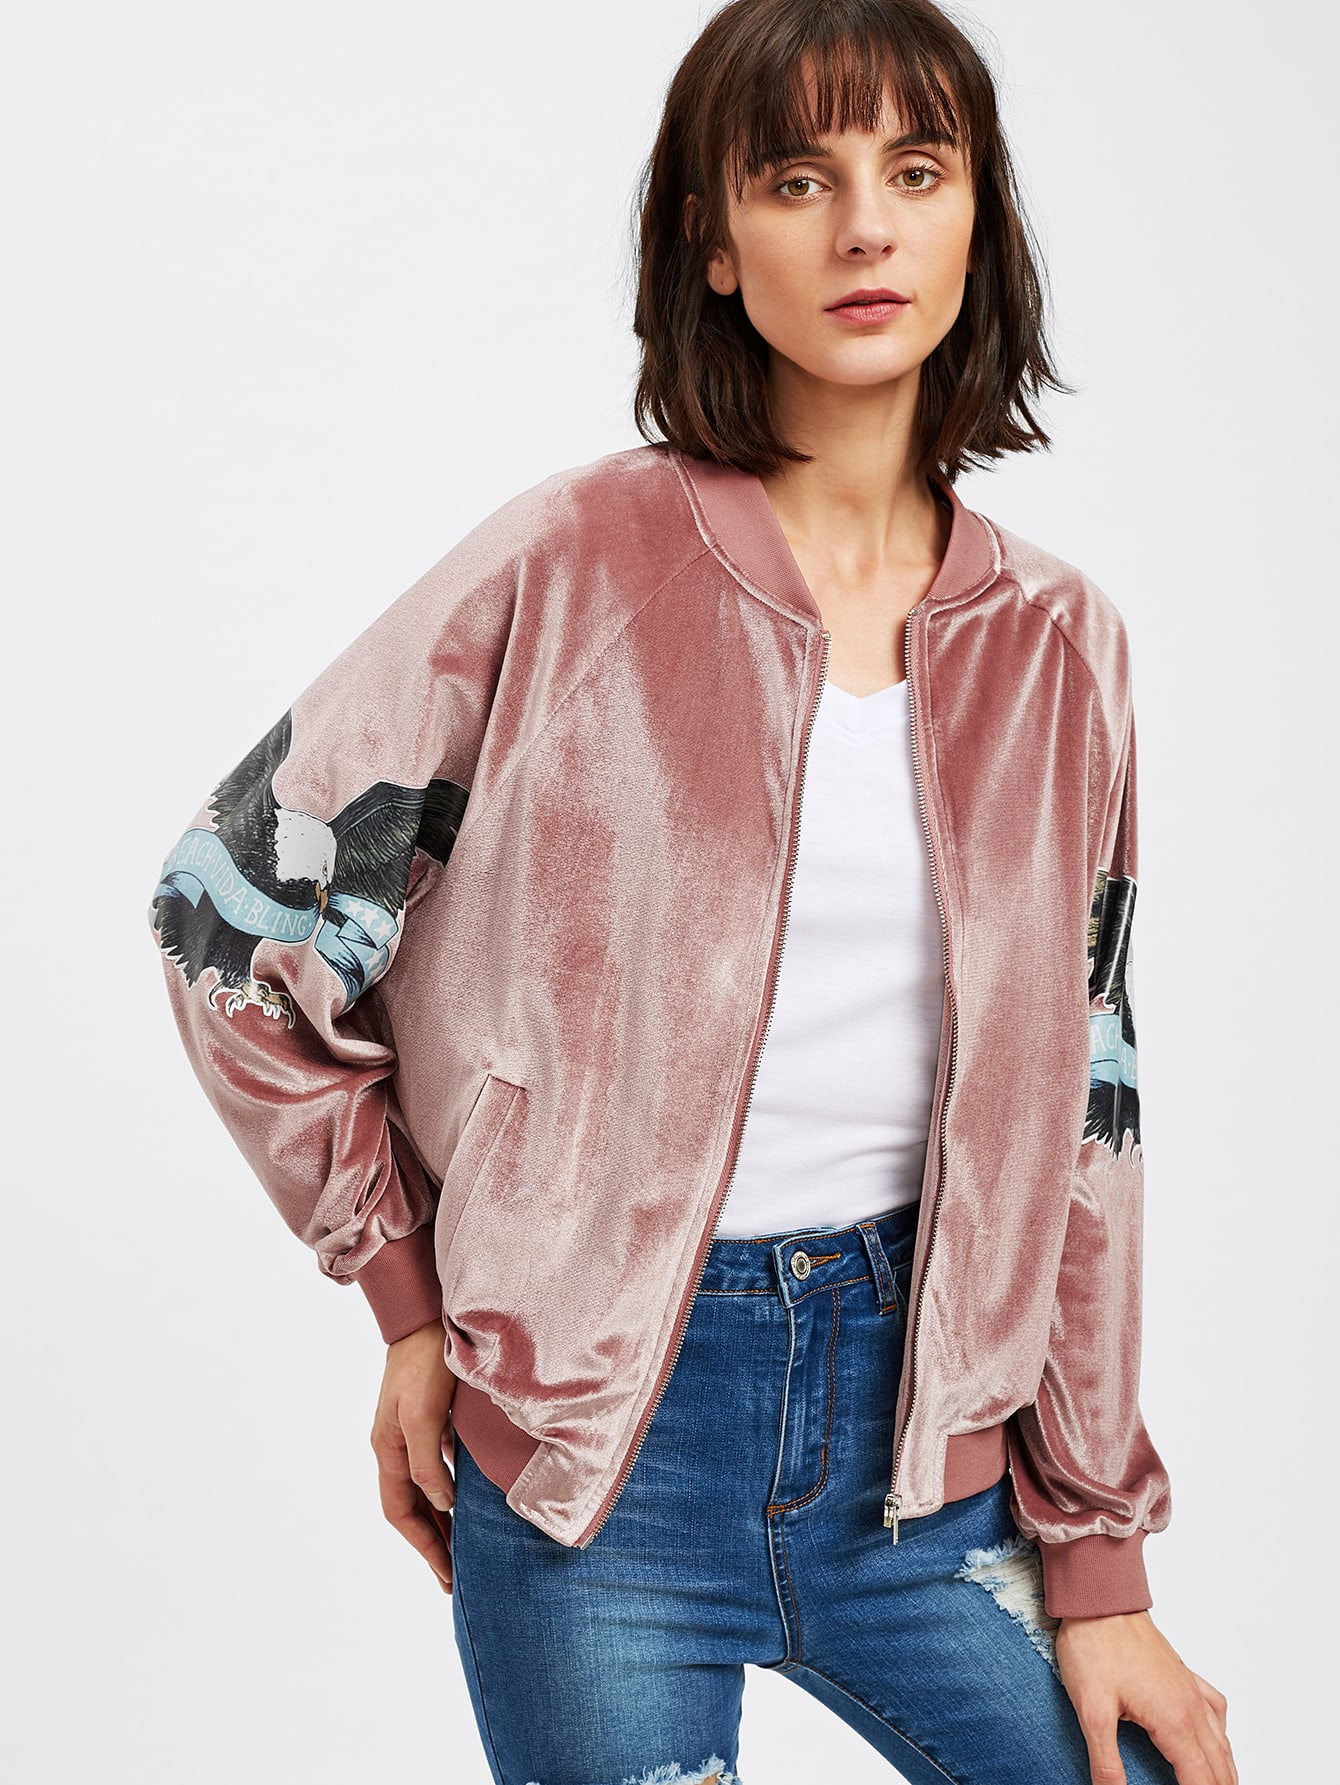 Eagle Patch Sleeve Zip Up Velvet Jacket zip up jacket